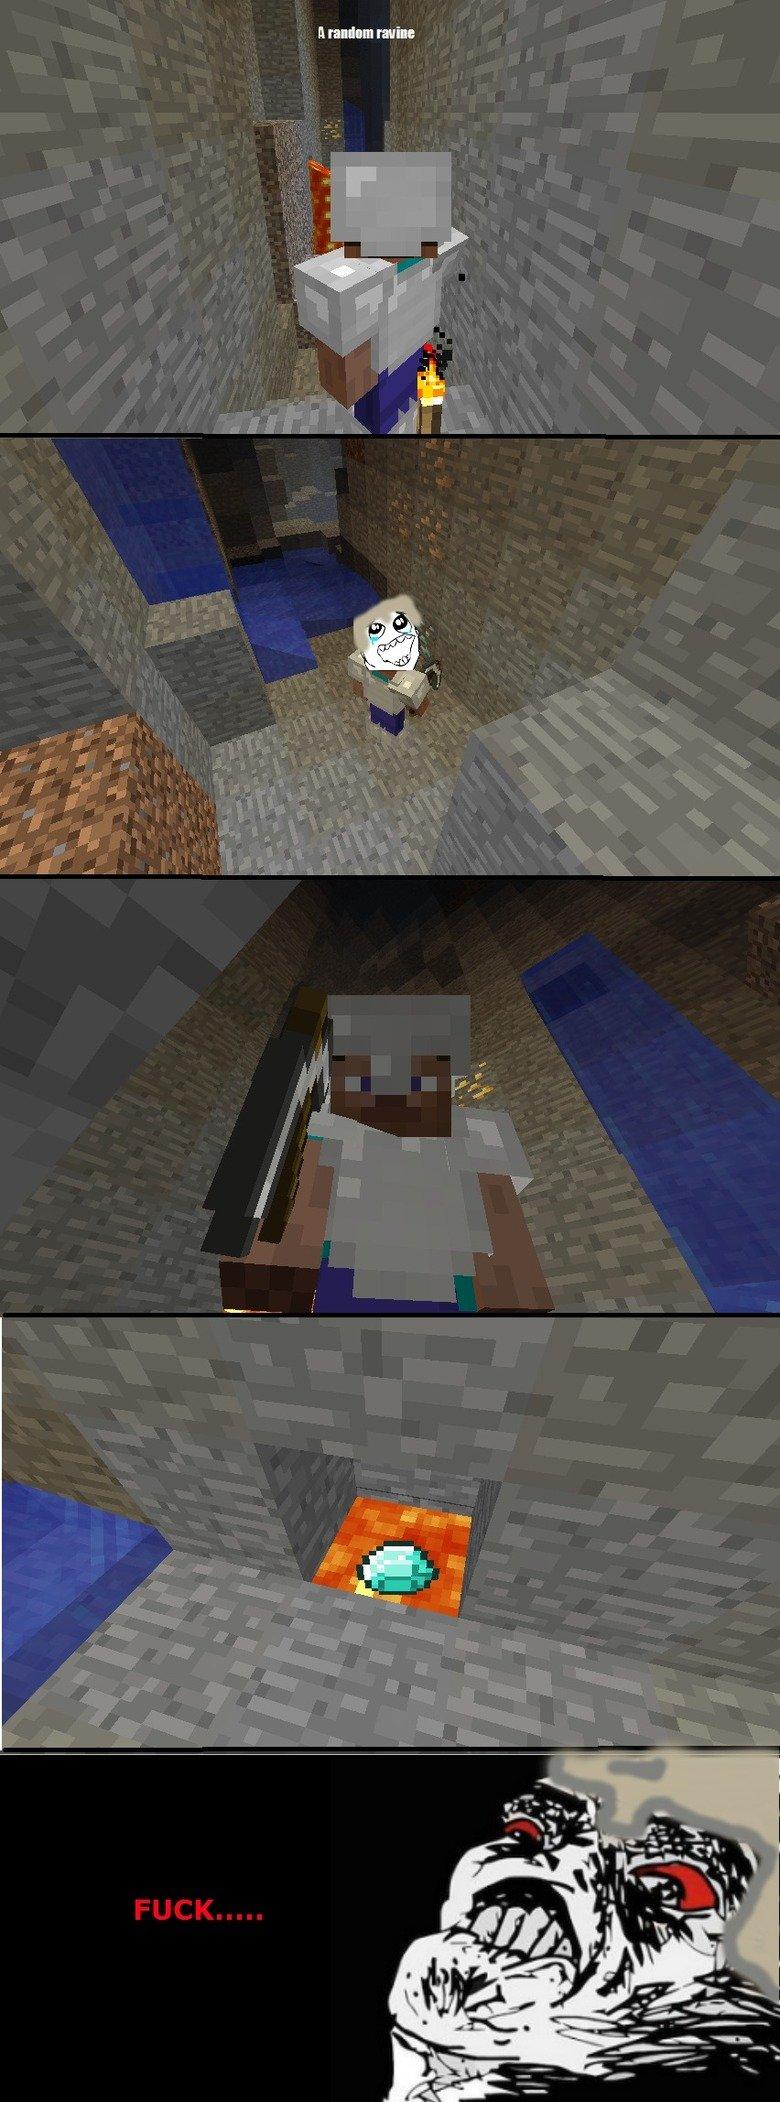 Minecraft Rage. .. i mine every block touching the diamond ore before i mine in